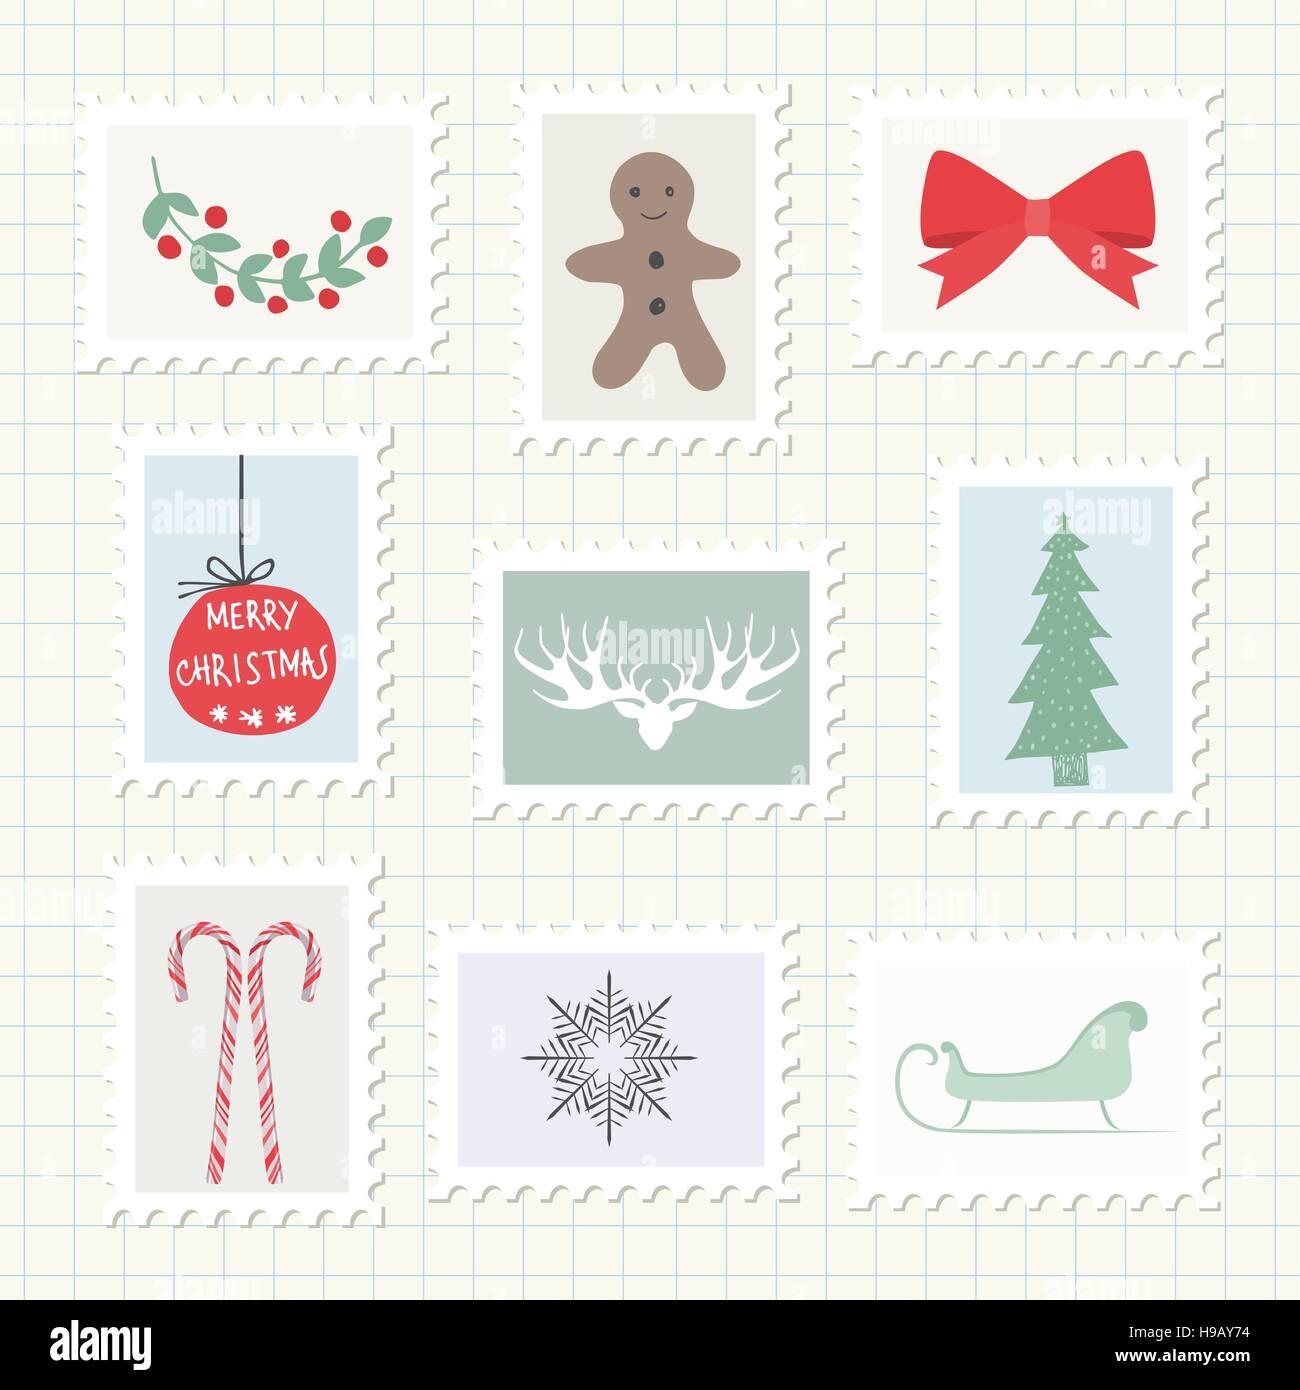 Christmas Postmark Collection. Vector Illustration - Stock Image